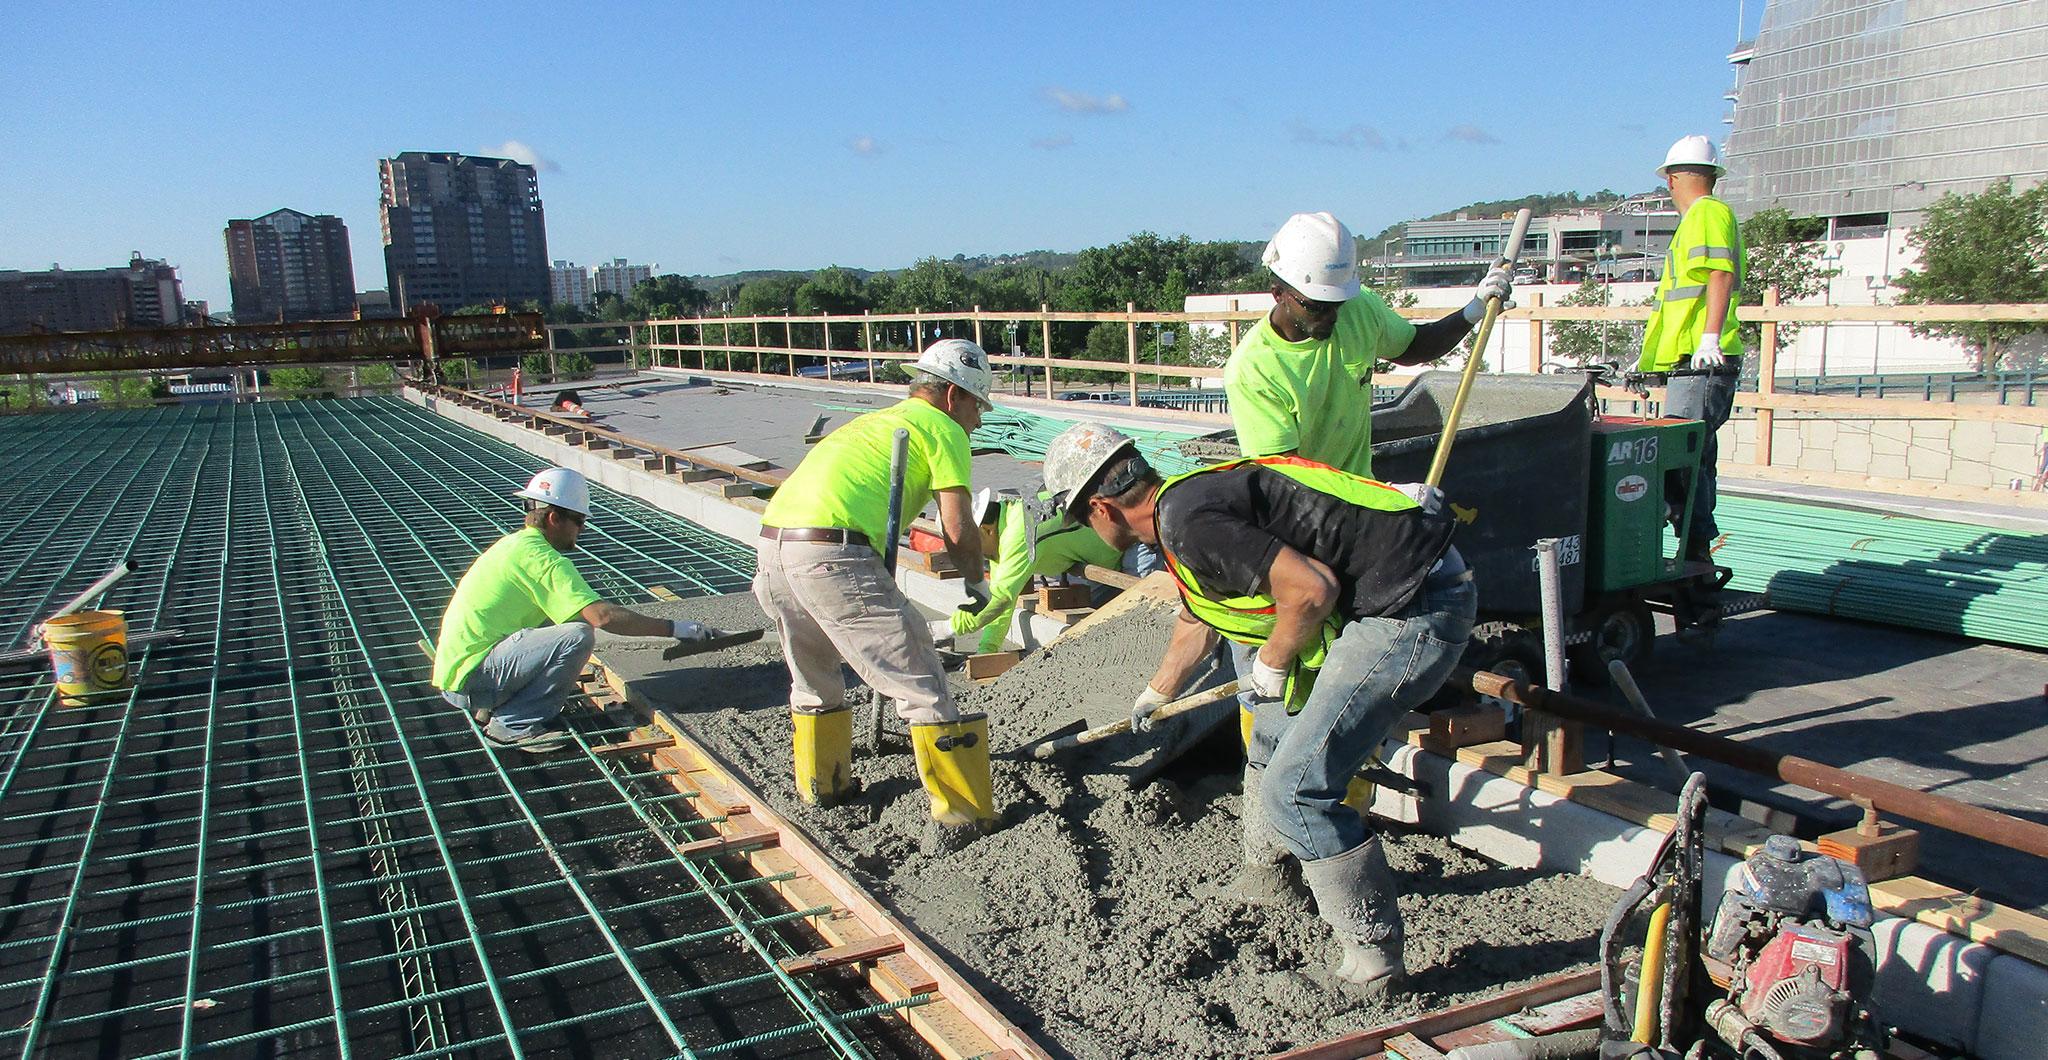 Construction at The Banks Cincinnati Project